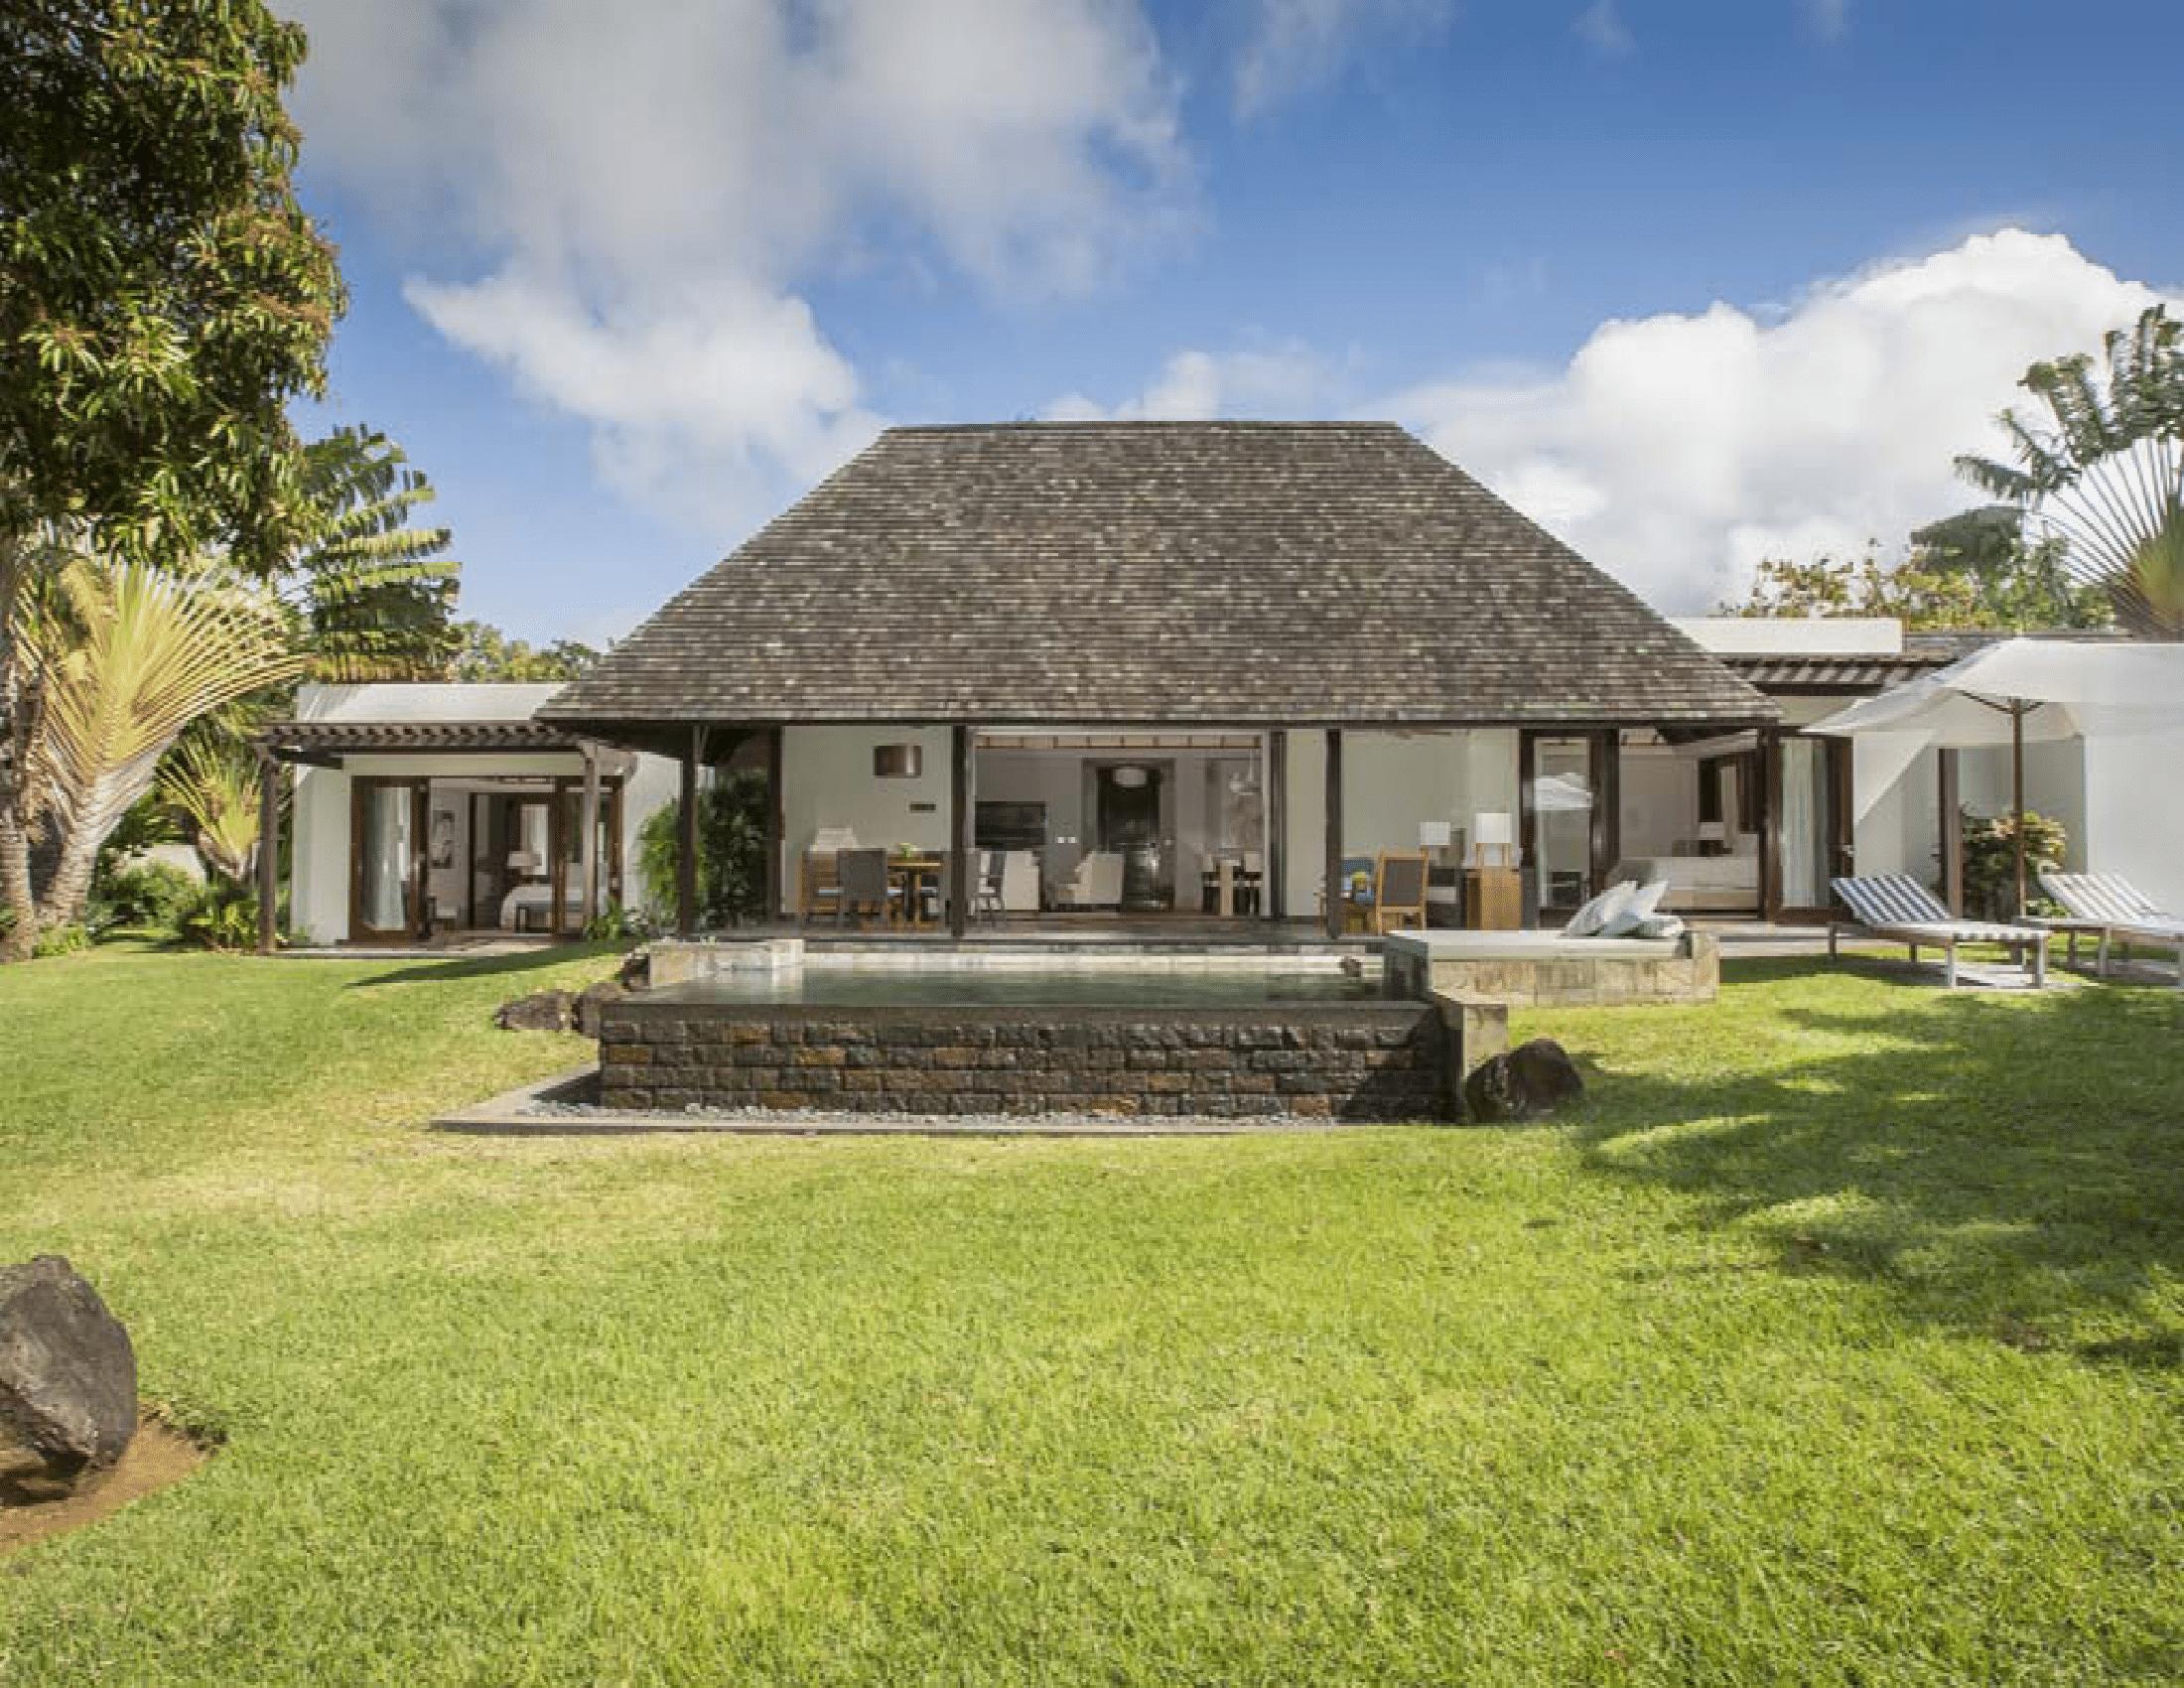 3 Bedroom Bungalow, For Sale – Four Seasons Resort, Mauritius at Anahita